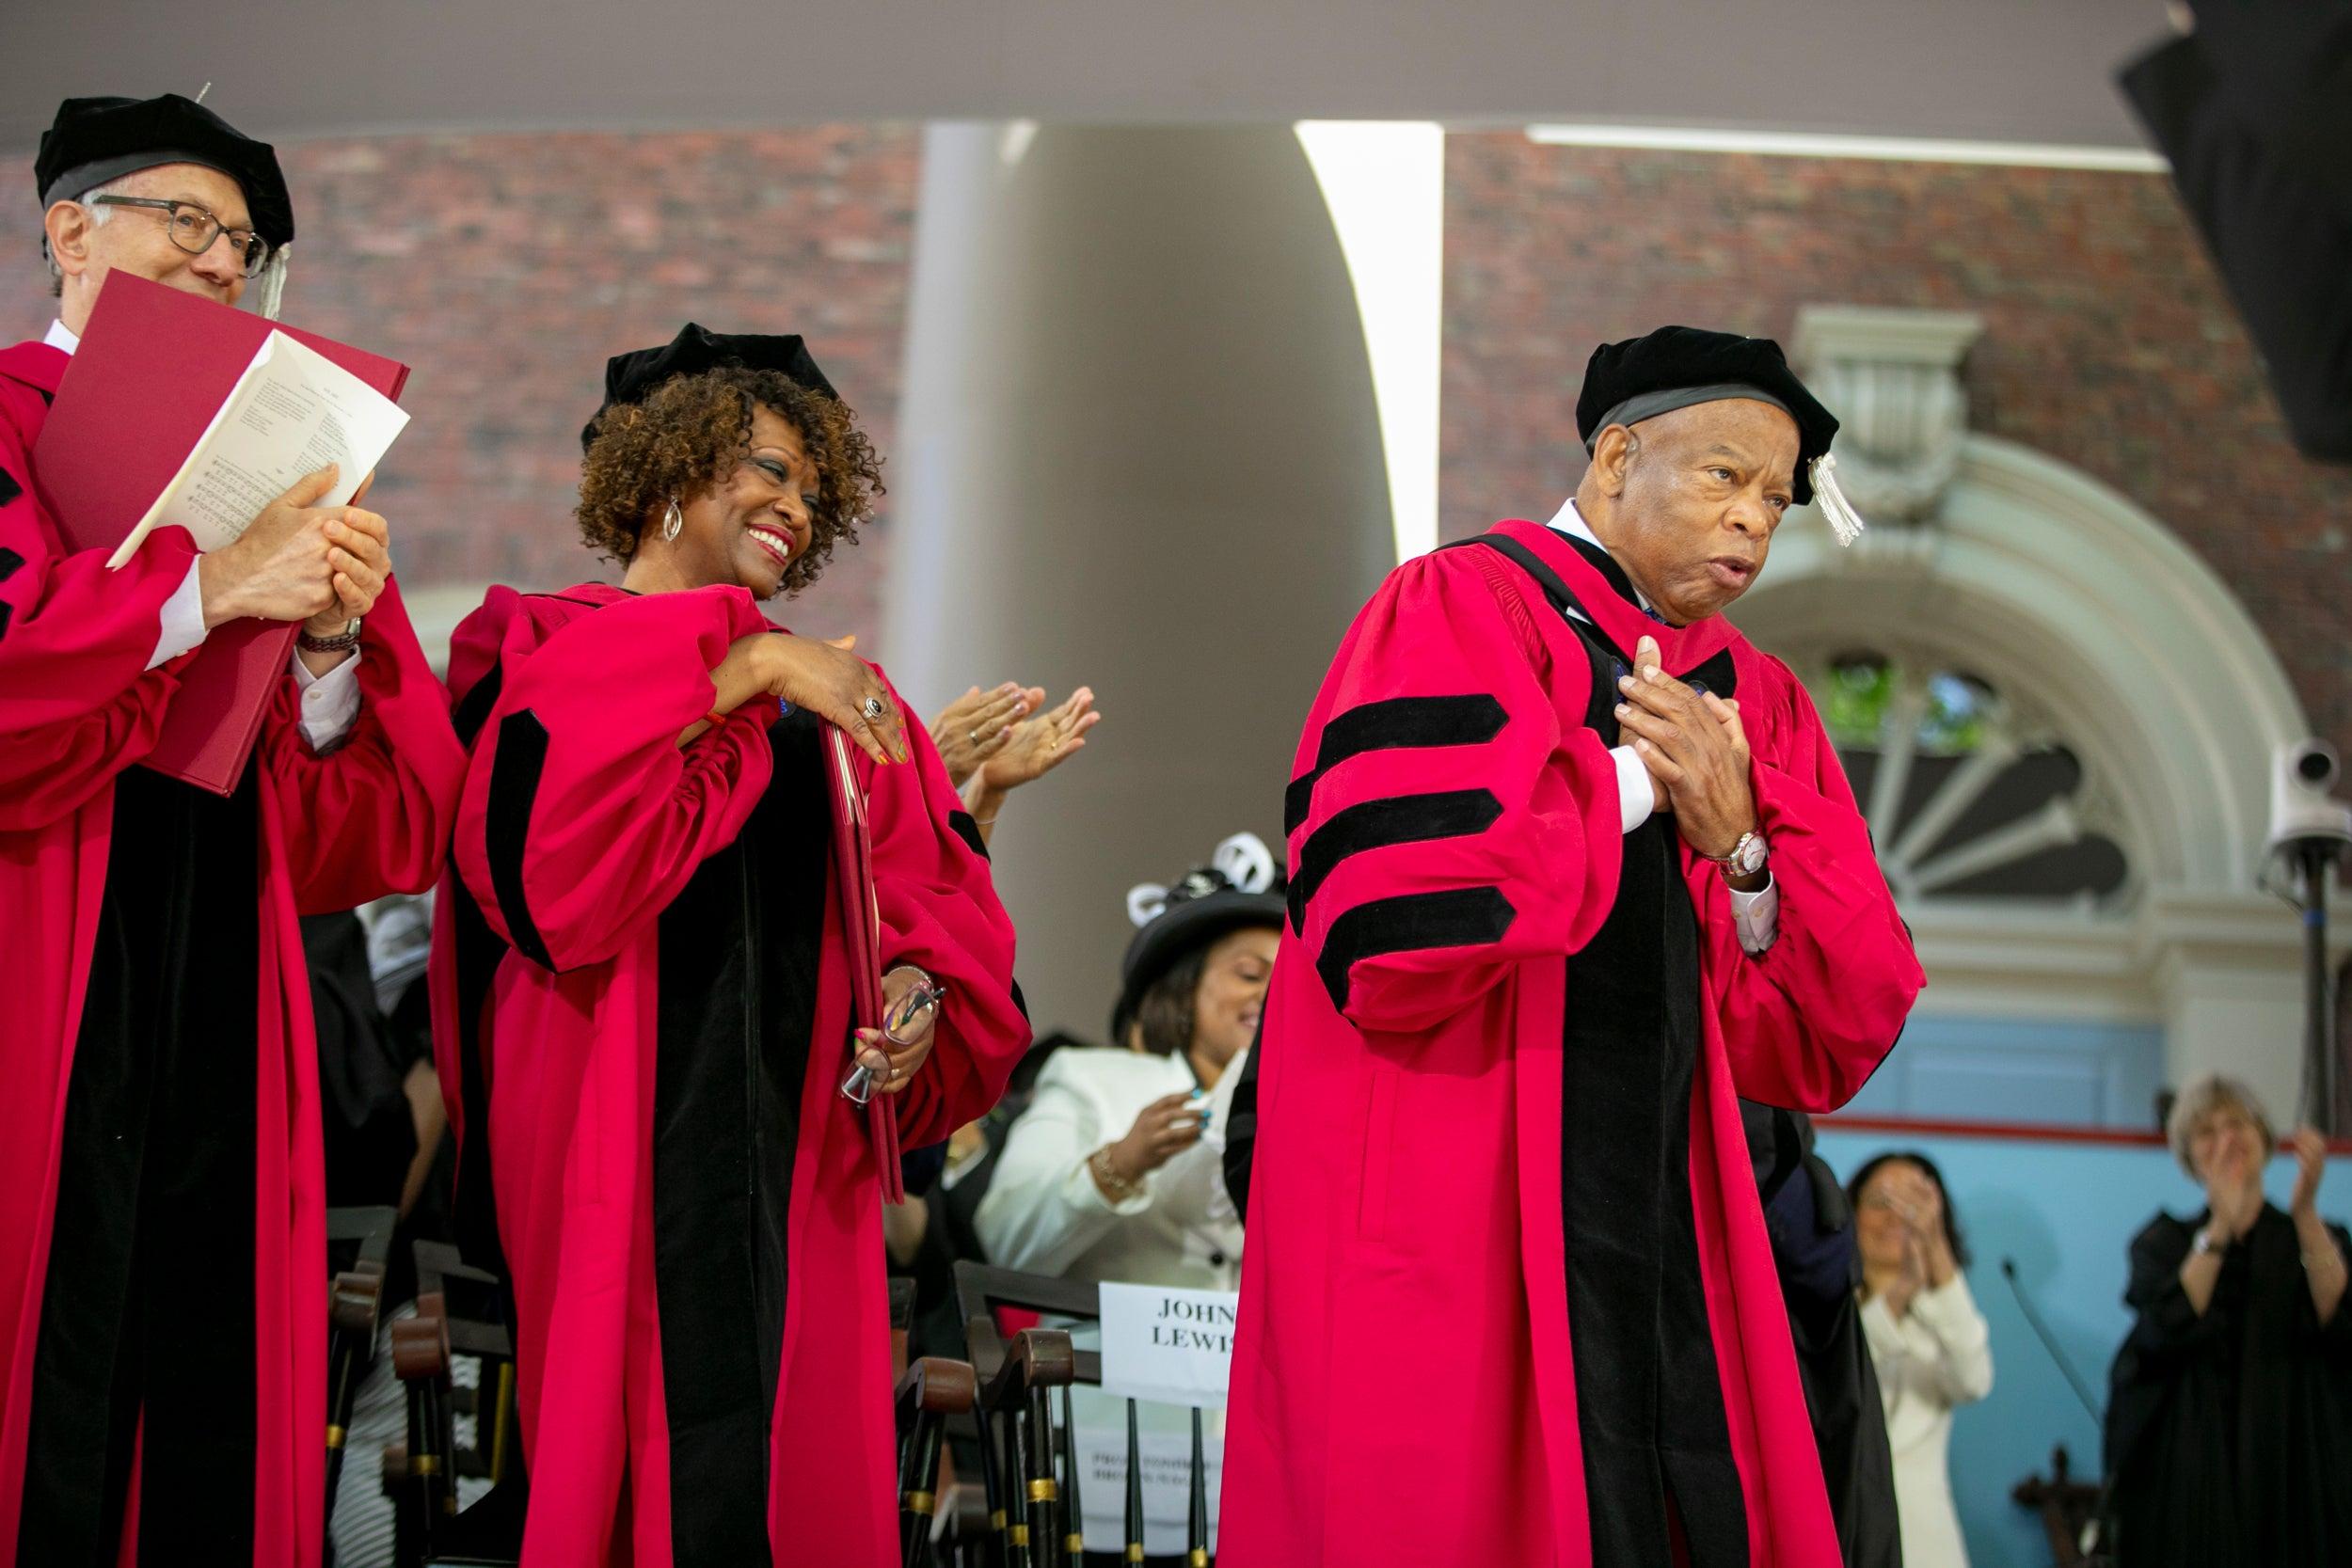 John Lewis at Harvard's 2018 Commencement.